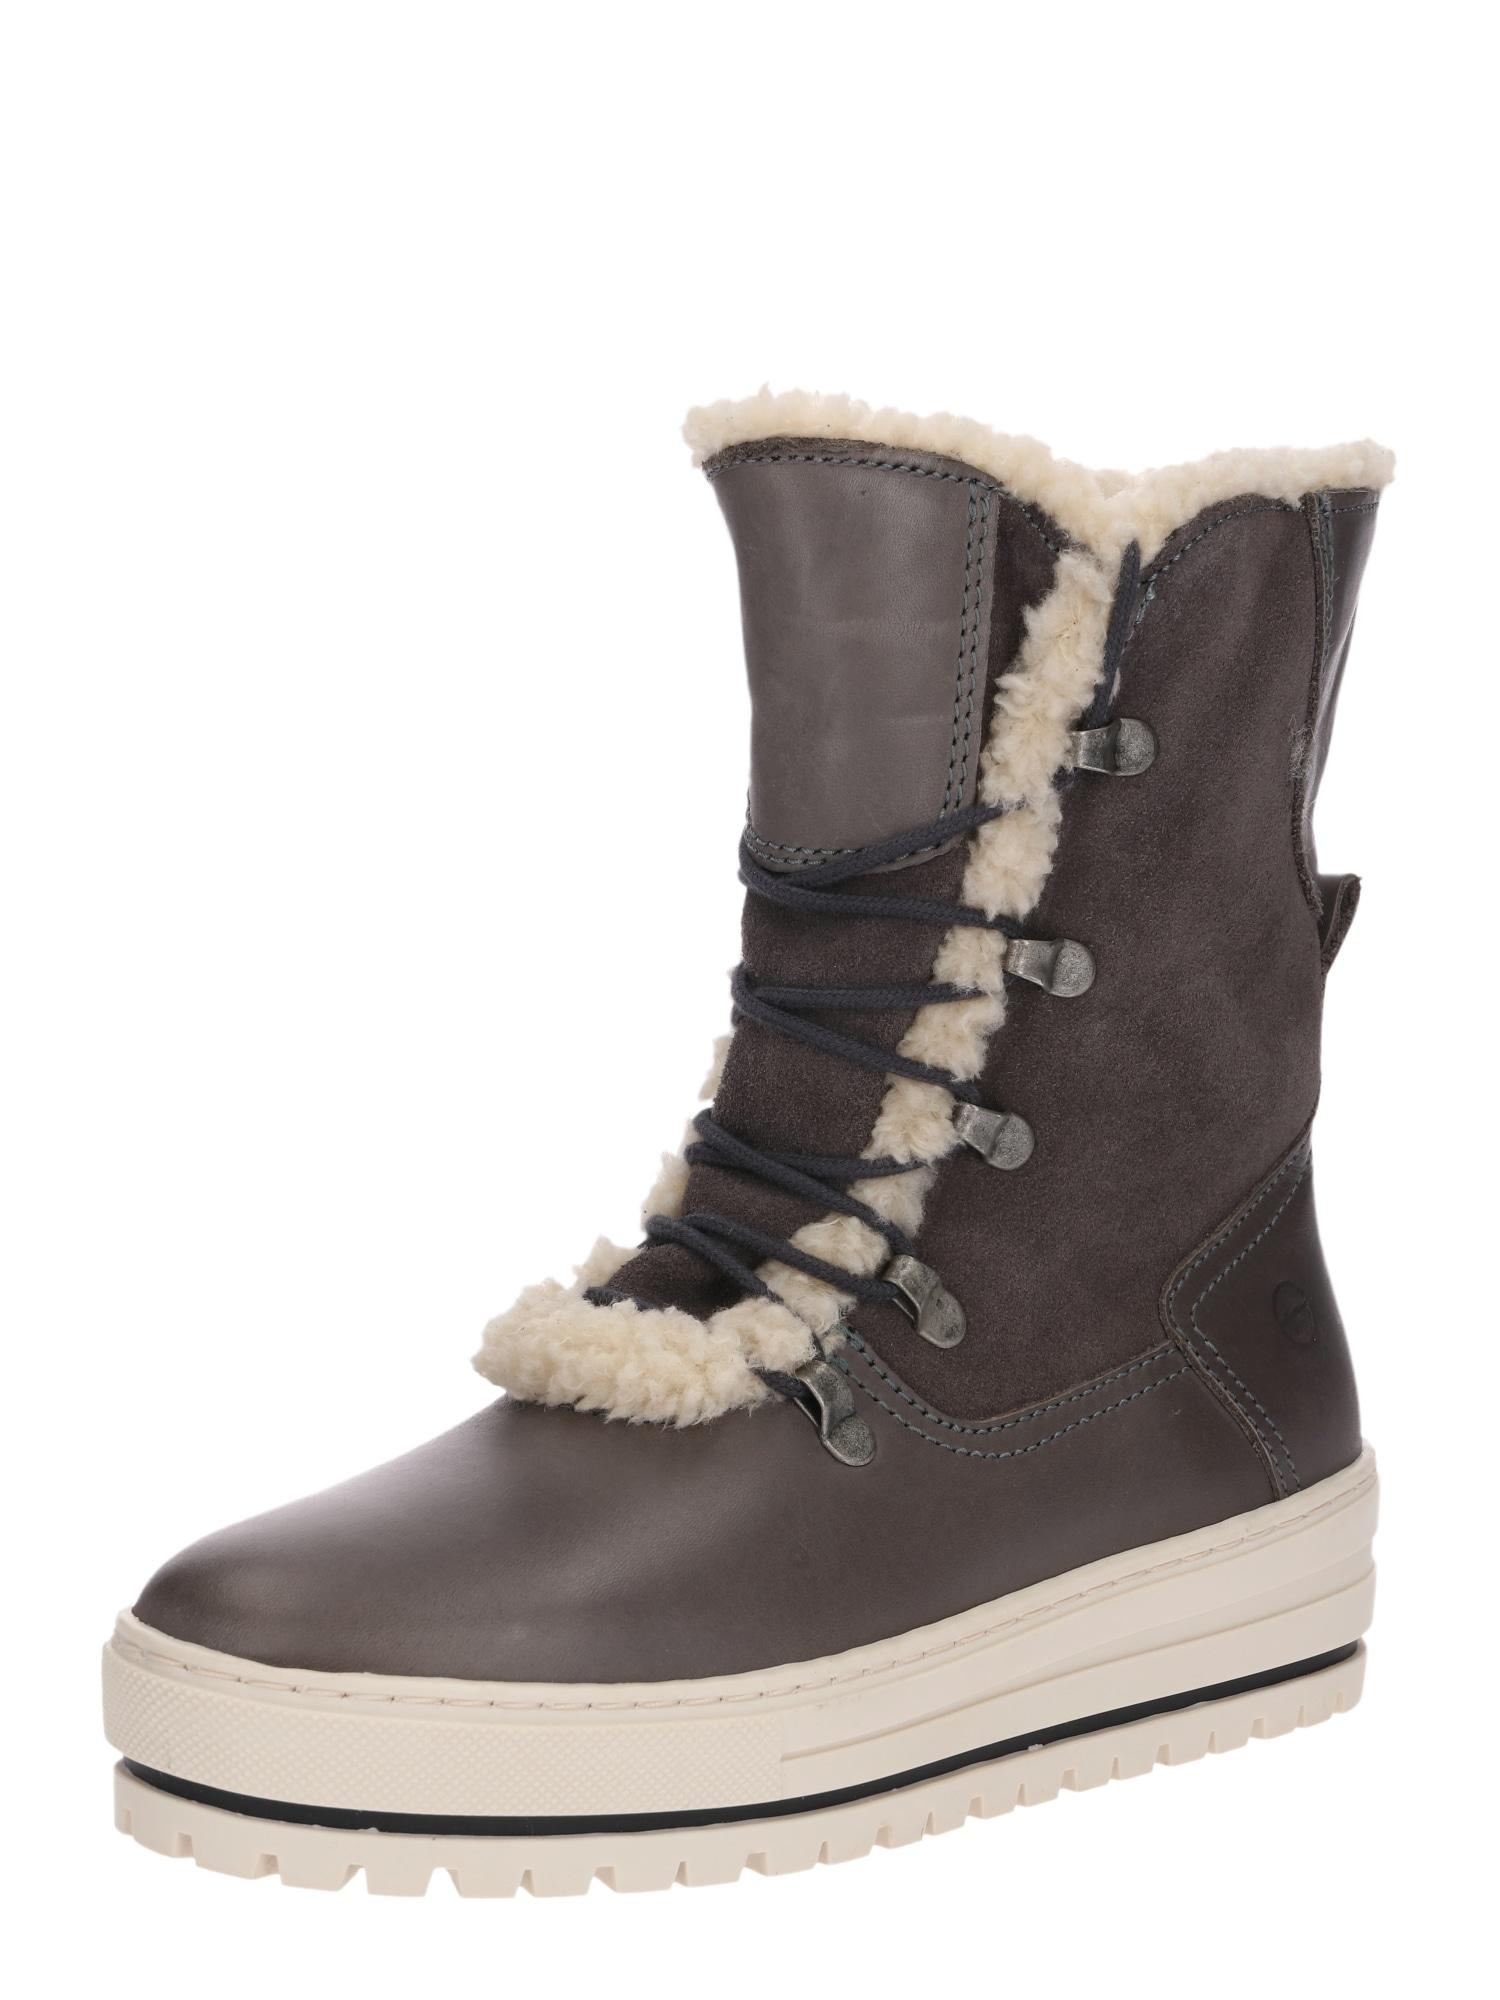 Sněhule Snowboots šedobéžová TAMARIS